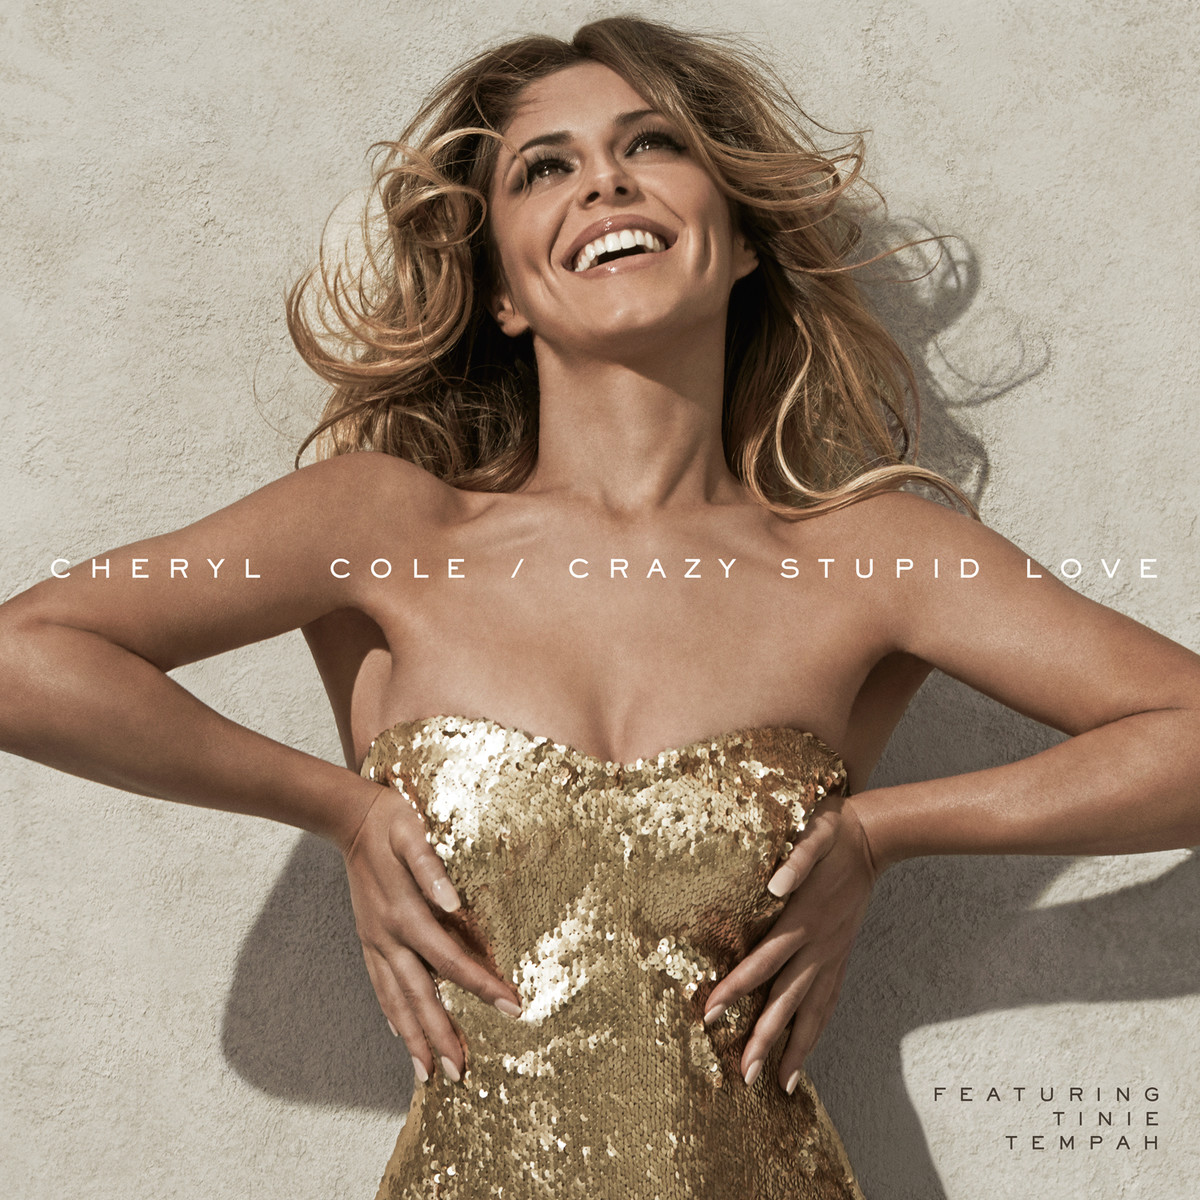 Cheryl Cole premieres comeback single 'Crazy Stupid Love' Cheryl Cole